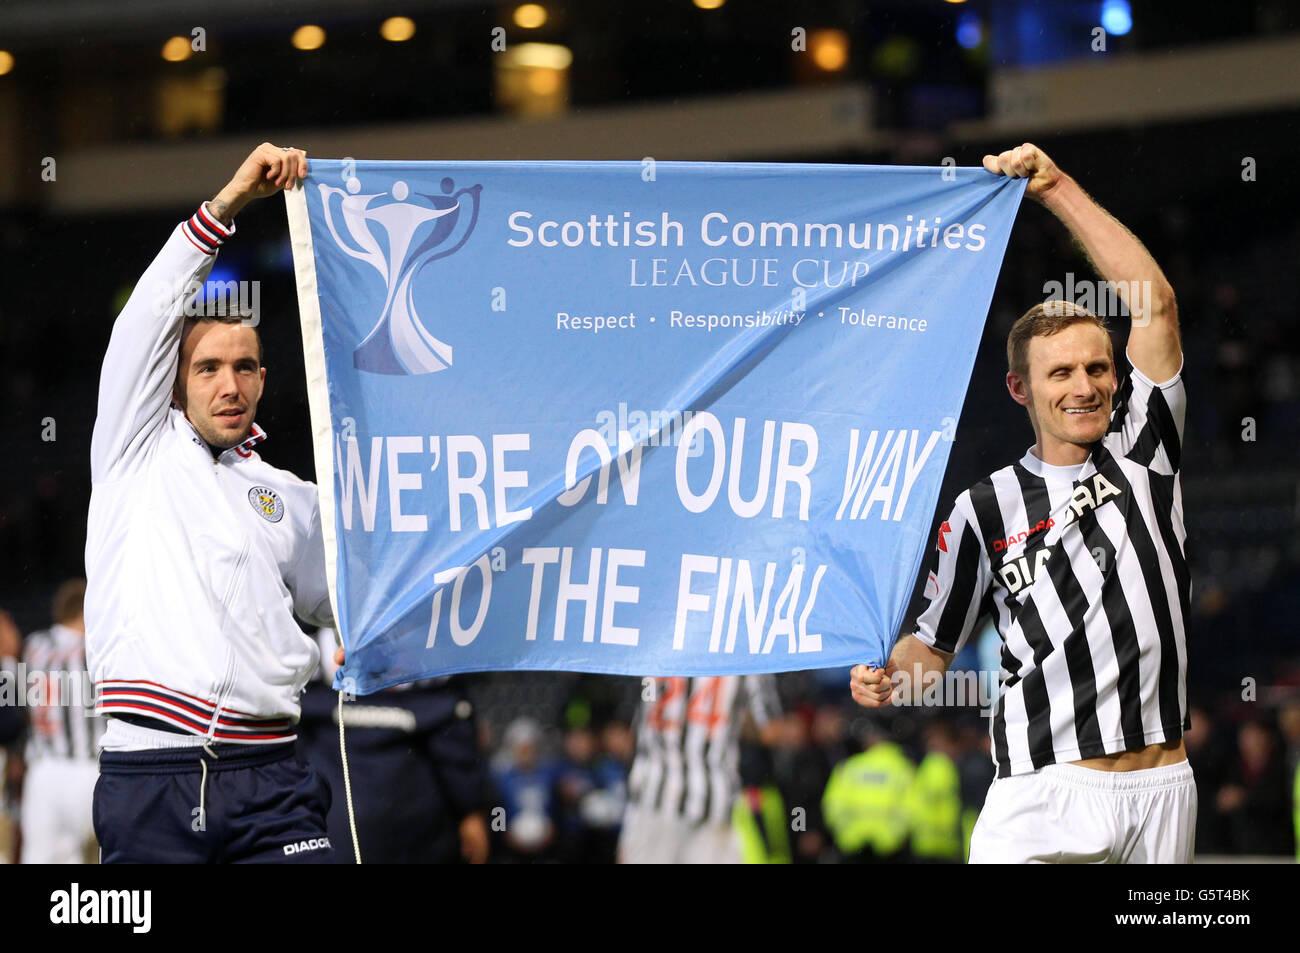 Soccer - Scottish Communities League Cup - Semi Final - St Mirren v Celtic - Hampden Park - Stock Image